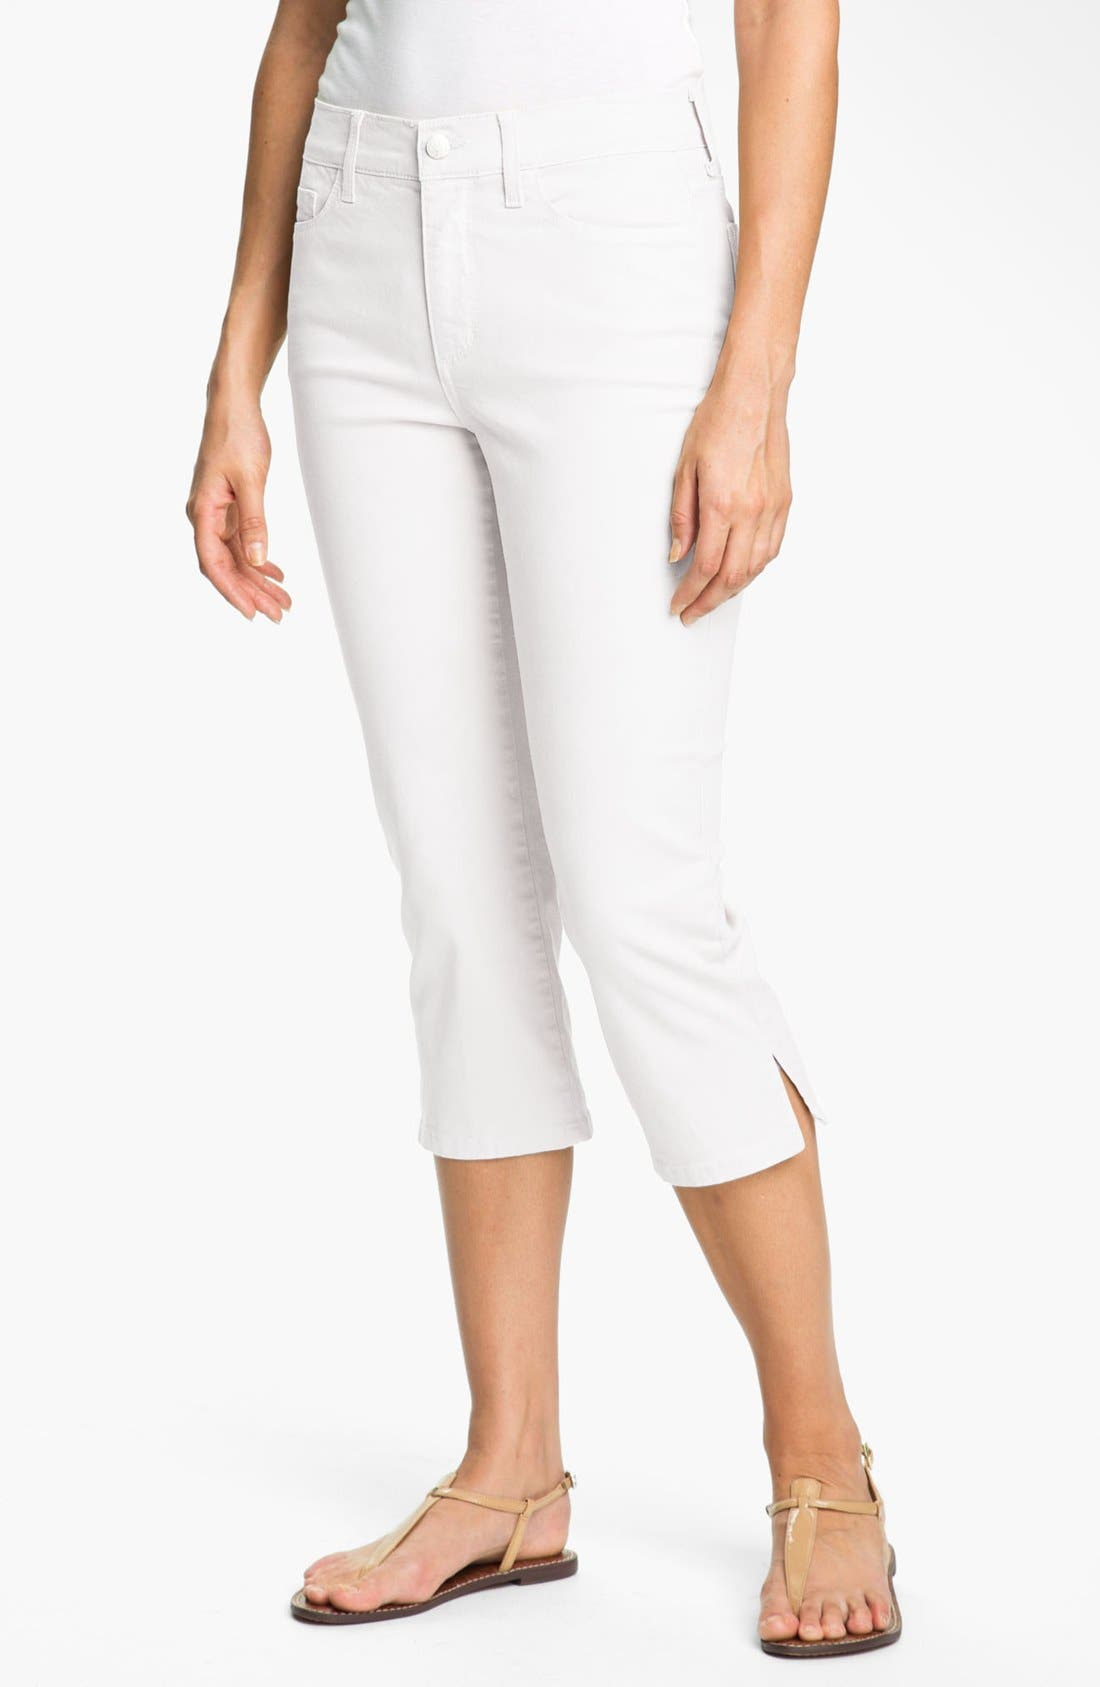 Alternate Image 1 Selected - NYDJ 'Nanette' Stretch Crop Jeans (Petite)